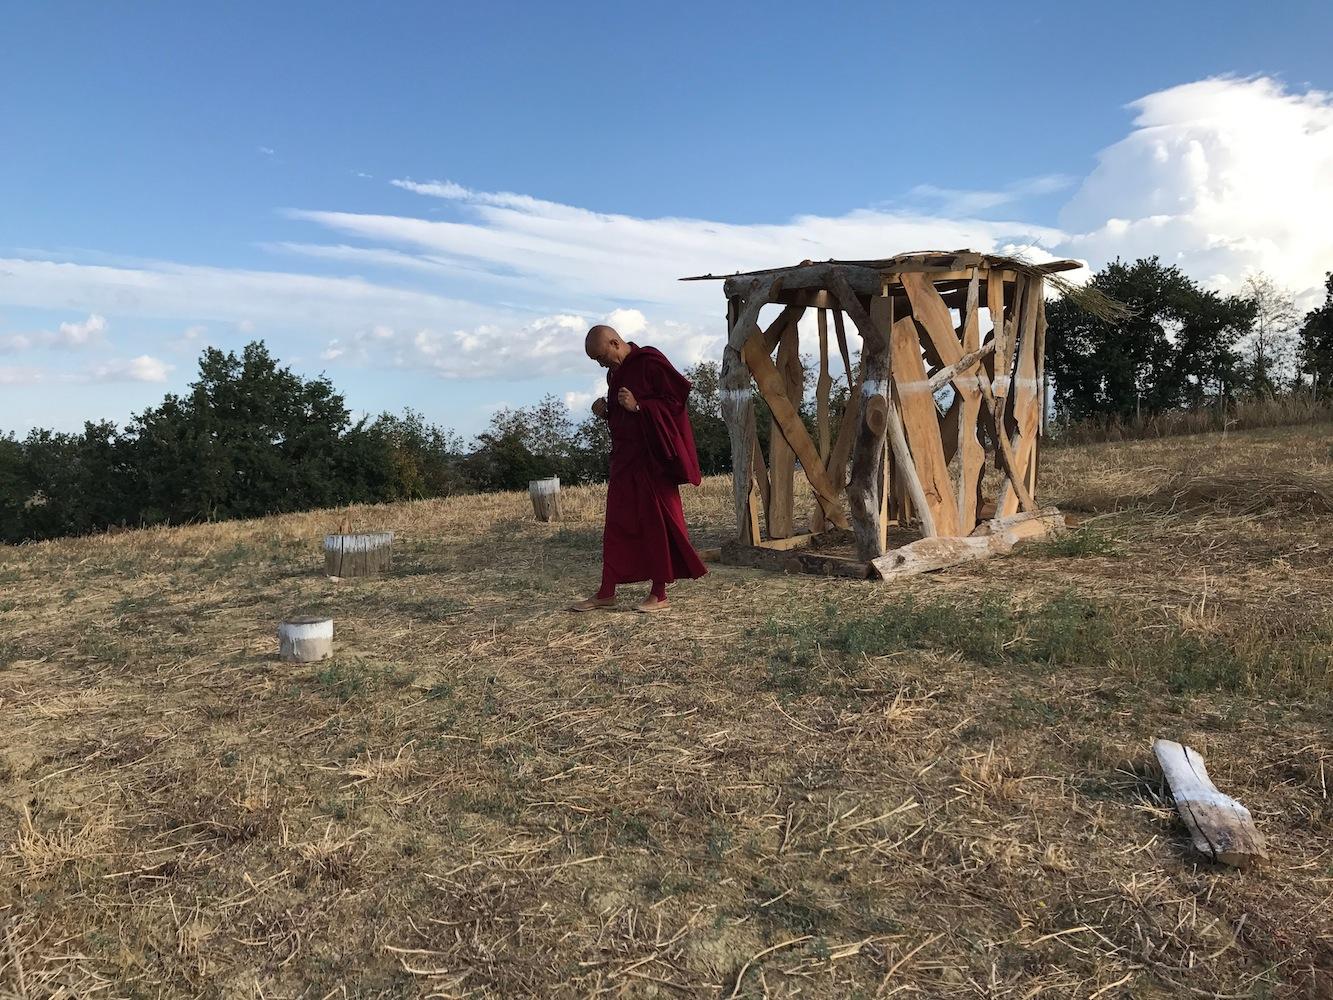 ll venerabile Lama Thubten Wangchen in visita a Bungalow Mantra di T-yong Chung, Ashram Joytinat (AN), 2017